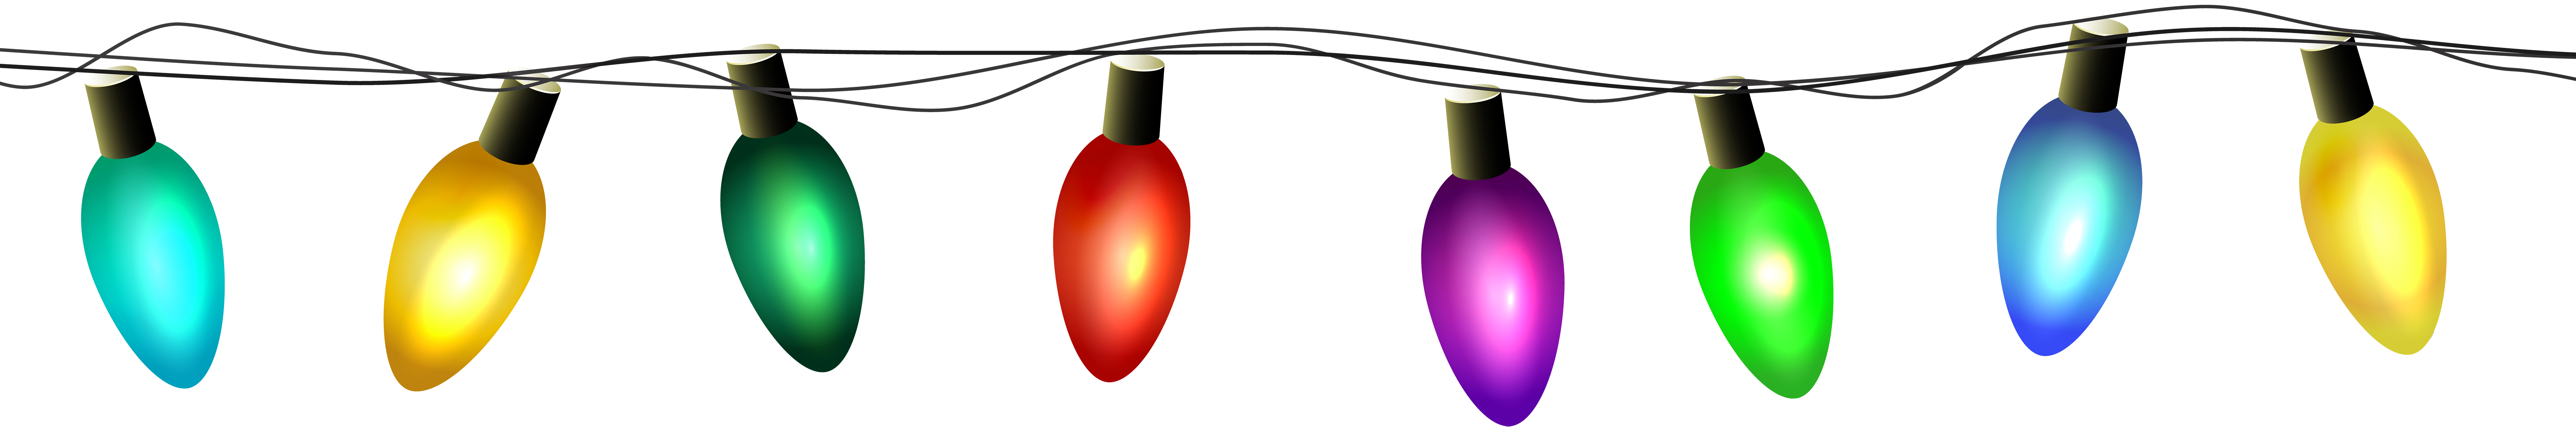 Christmas Lights Transparent PNG Clip Art.